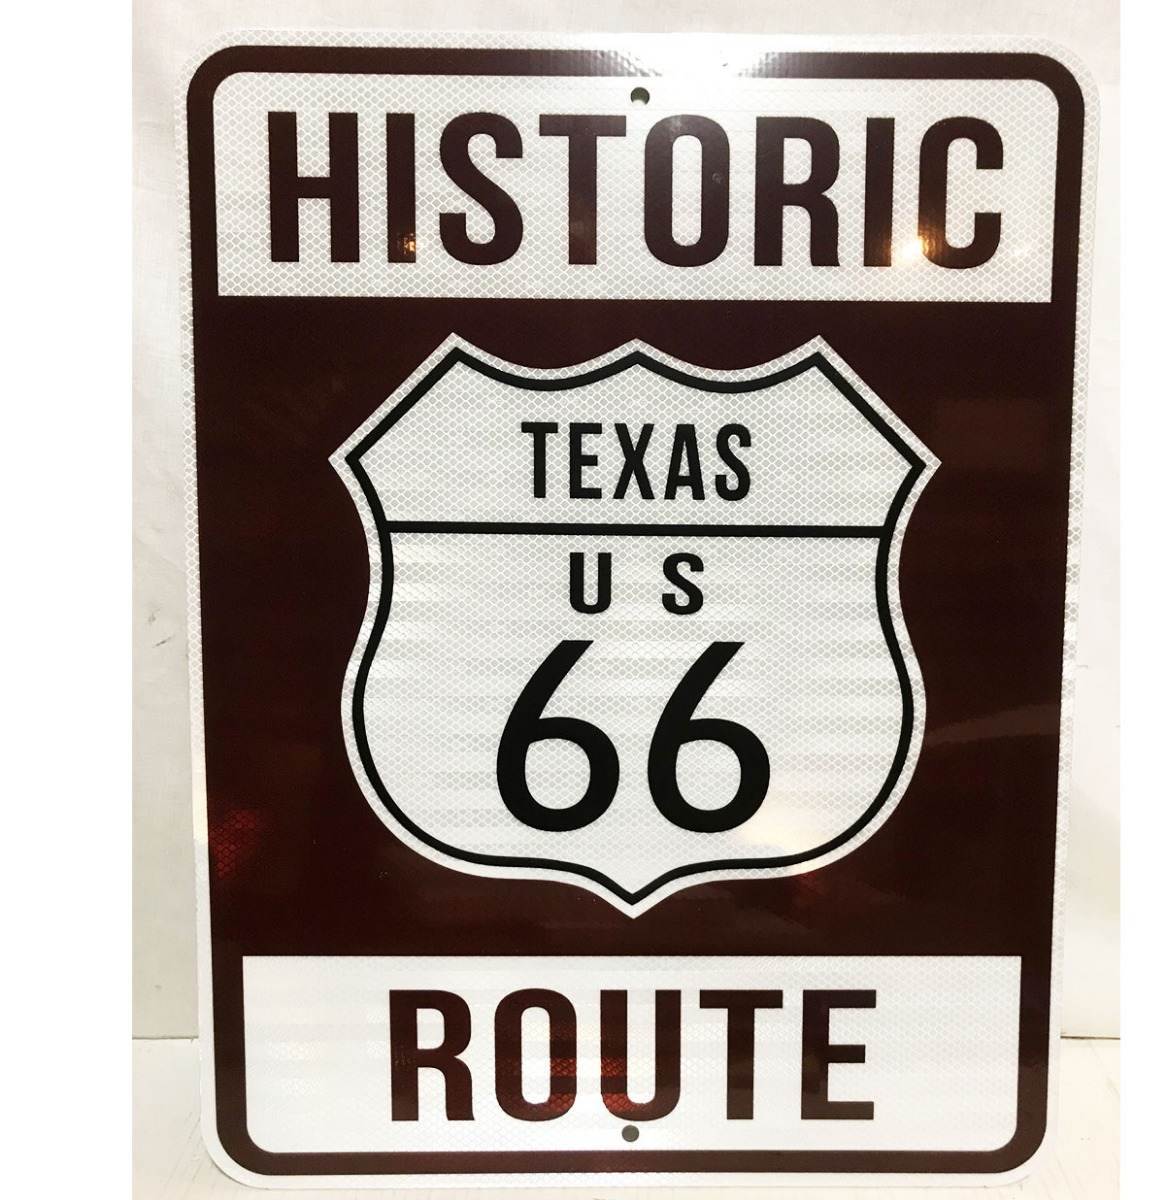 Historic Route 66 Texas Snelweg Bord - Reflecterend